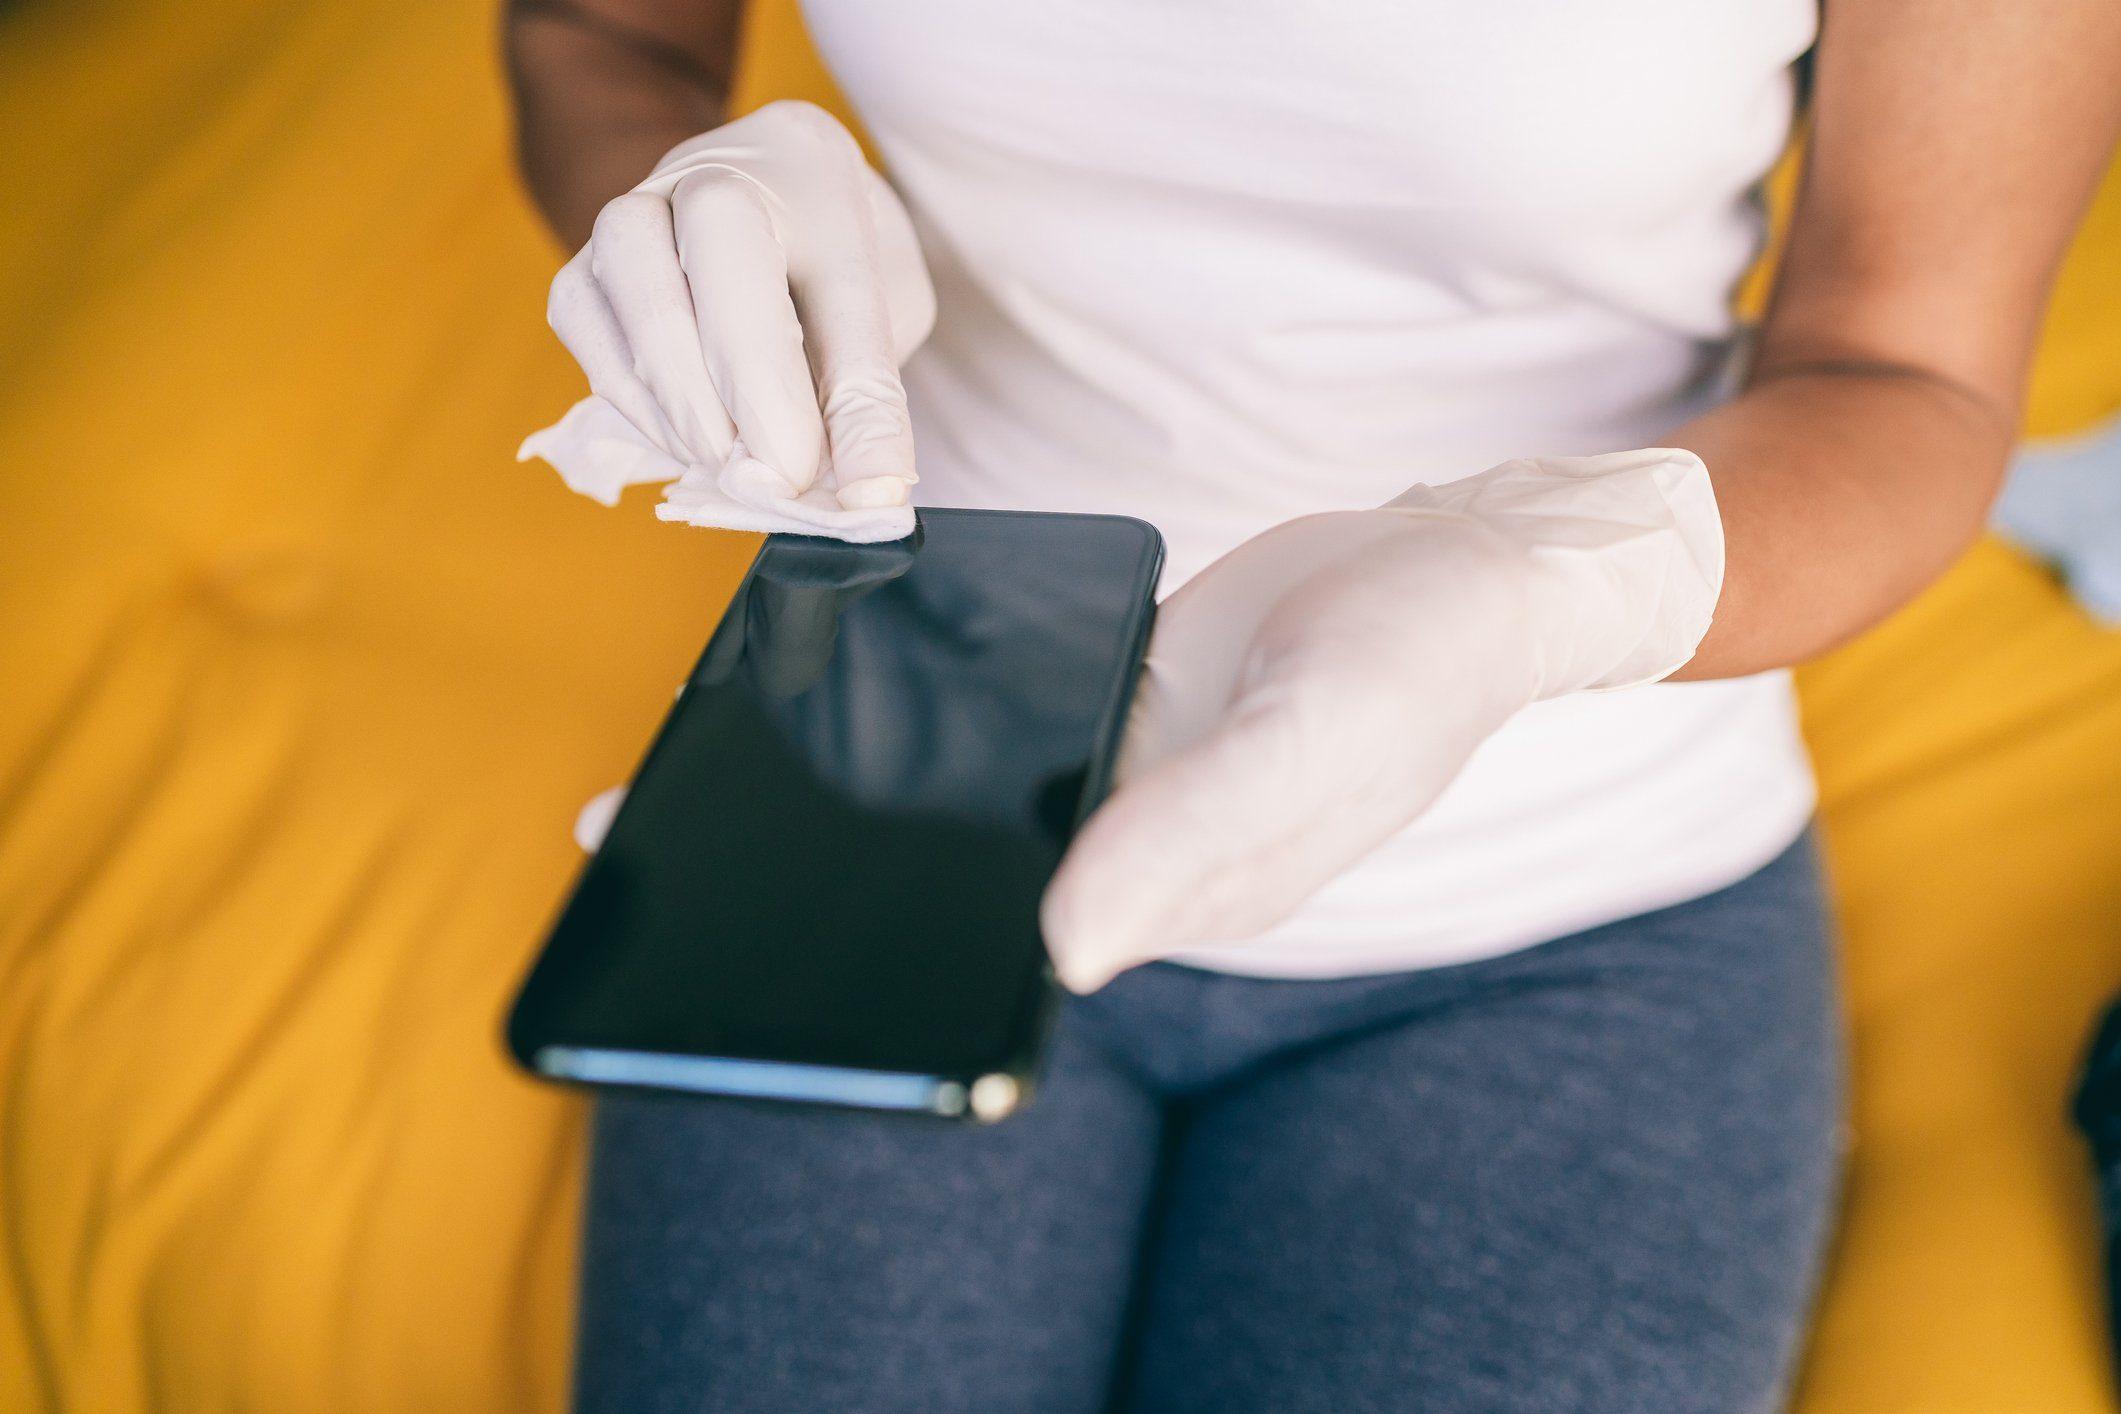 Covid-19 - Disinfection smartphone